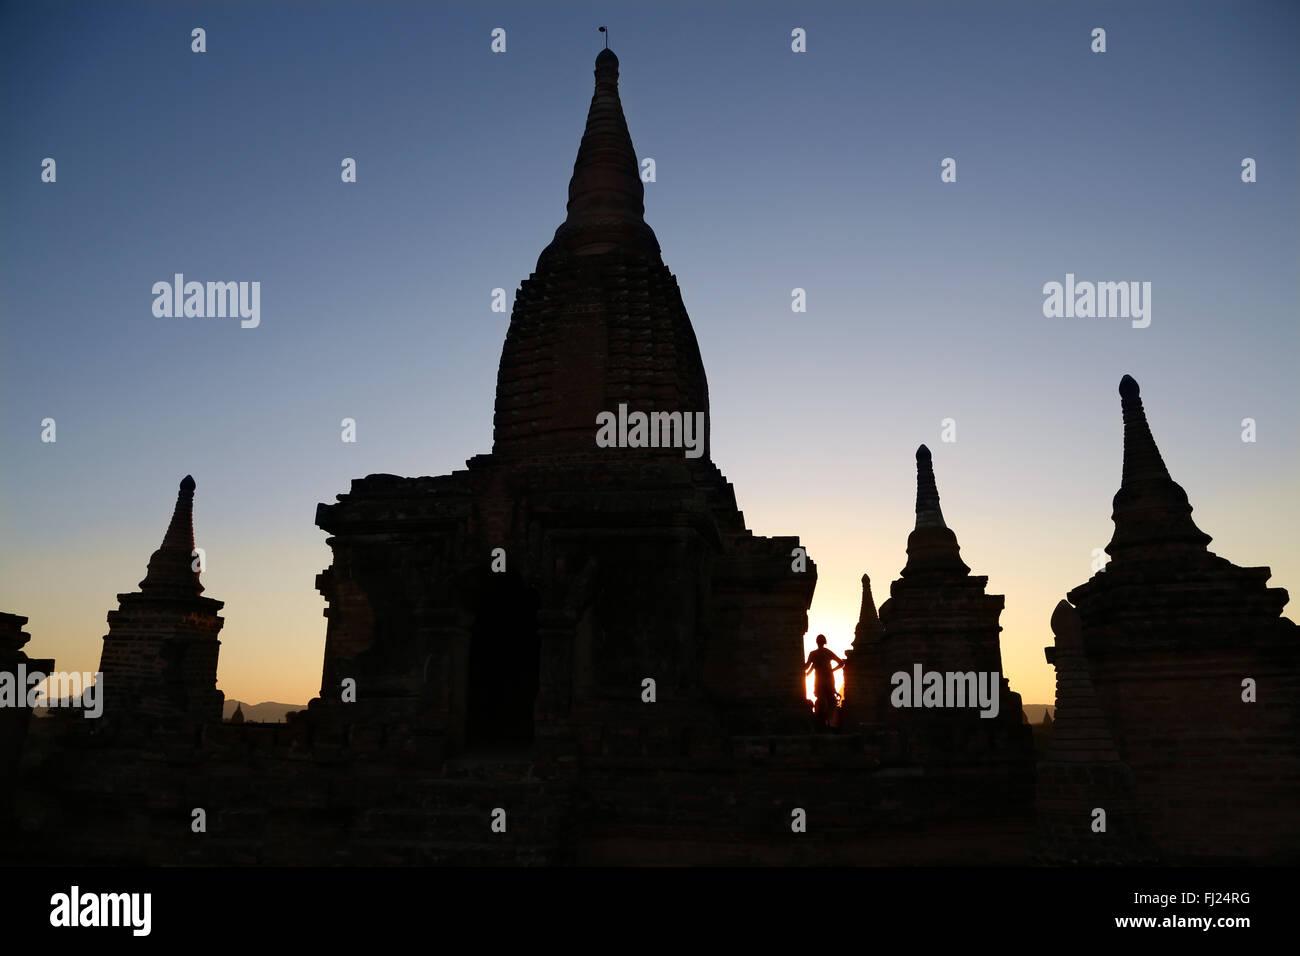 Silhouette der Tempel in Bagan, Hintergrundbeleuchtung, Myanmar Stockbild